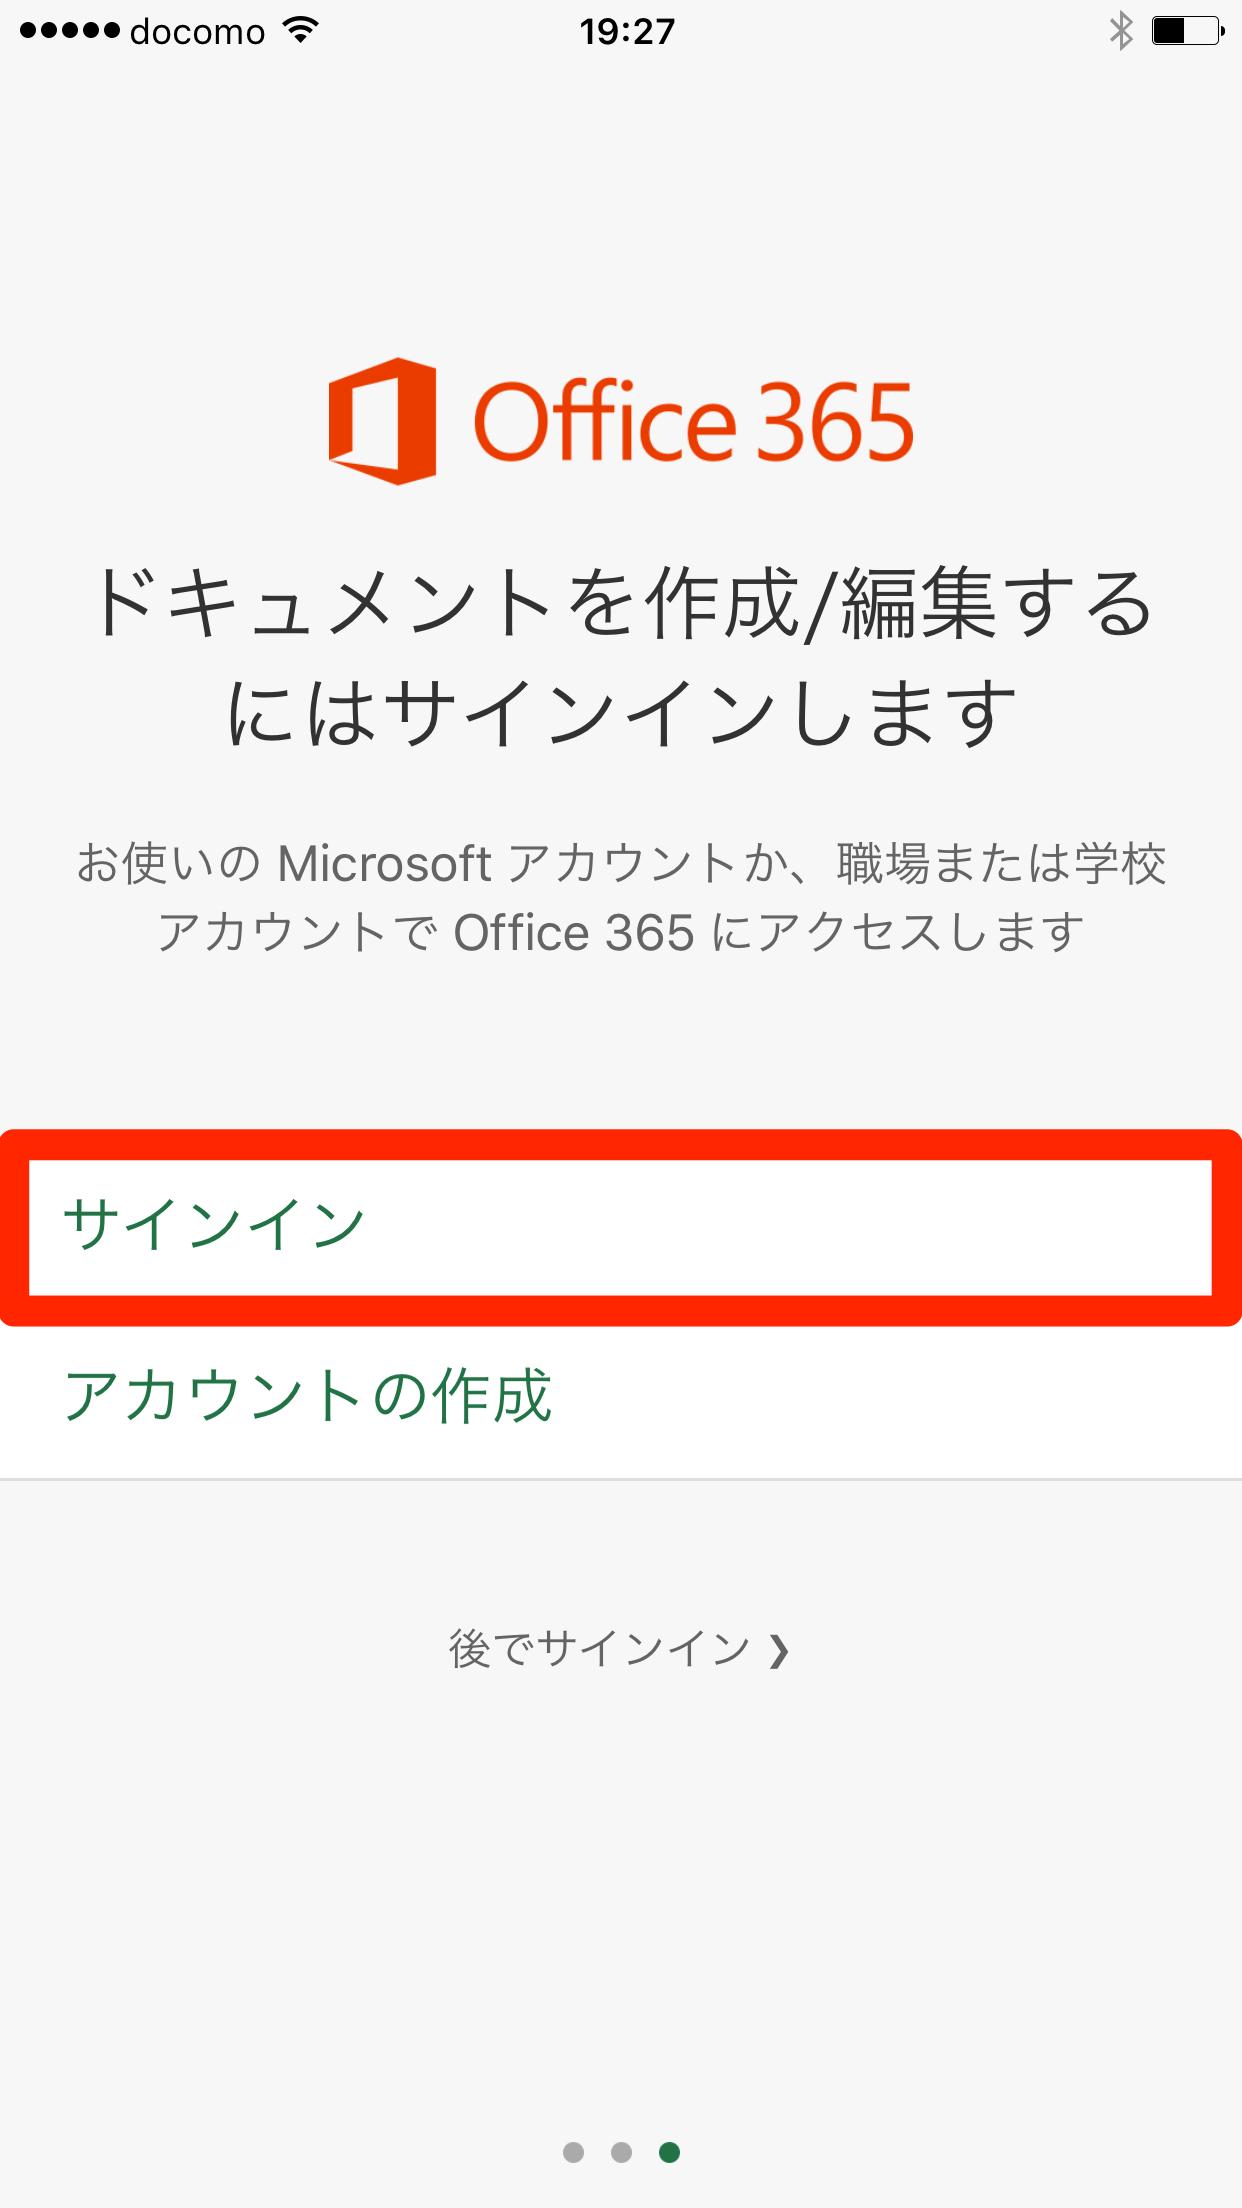 Microsoftアカウントでサインインする